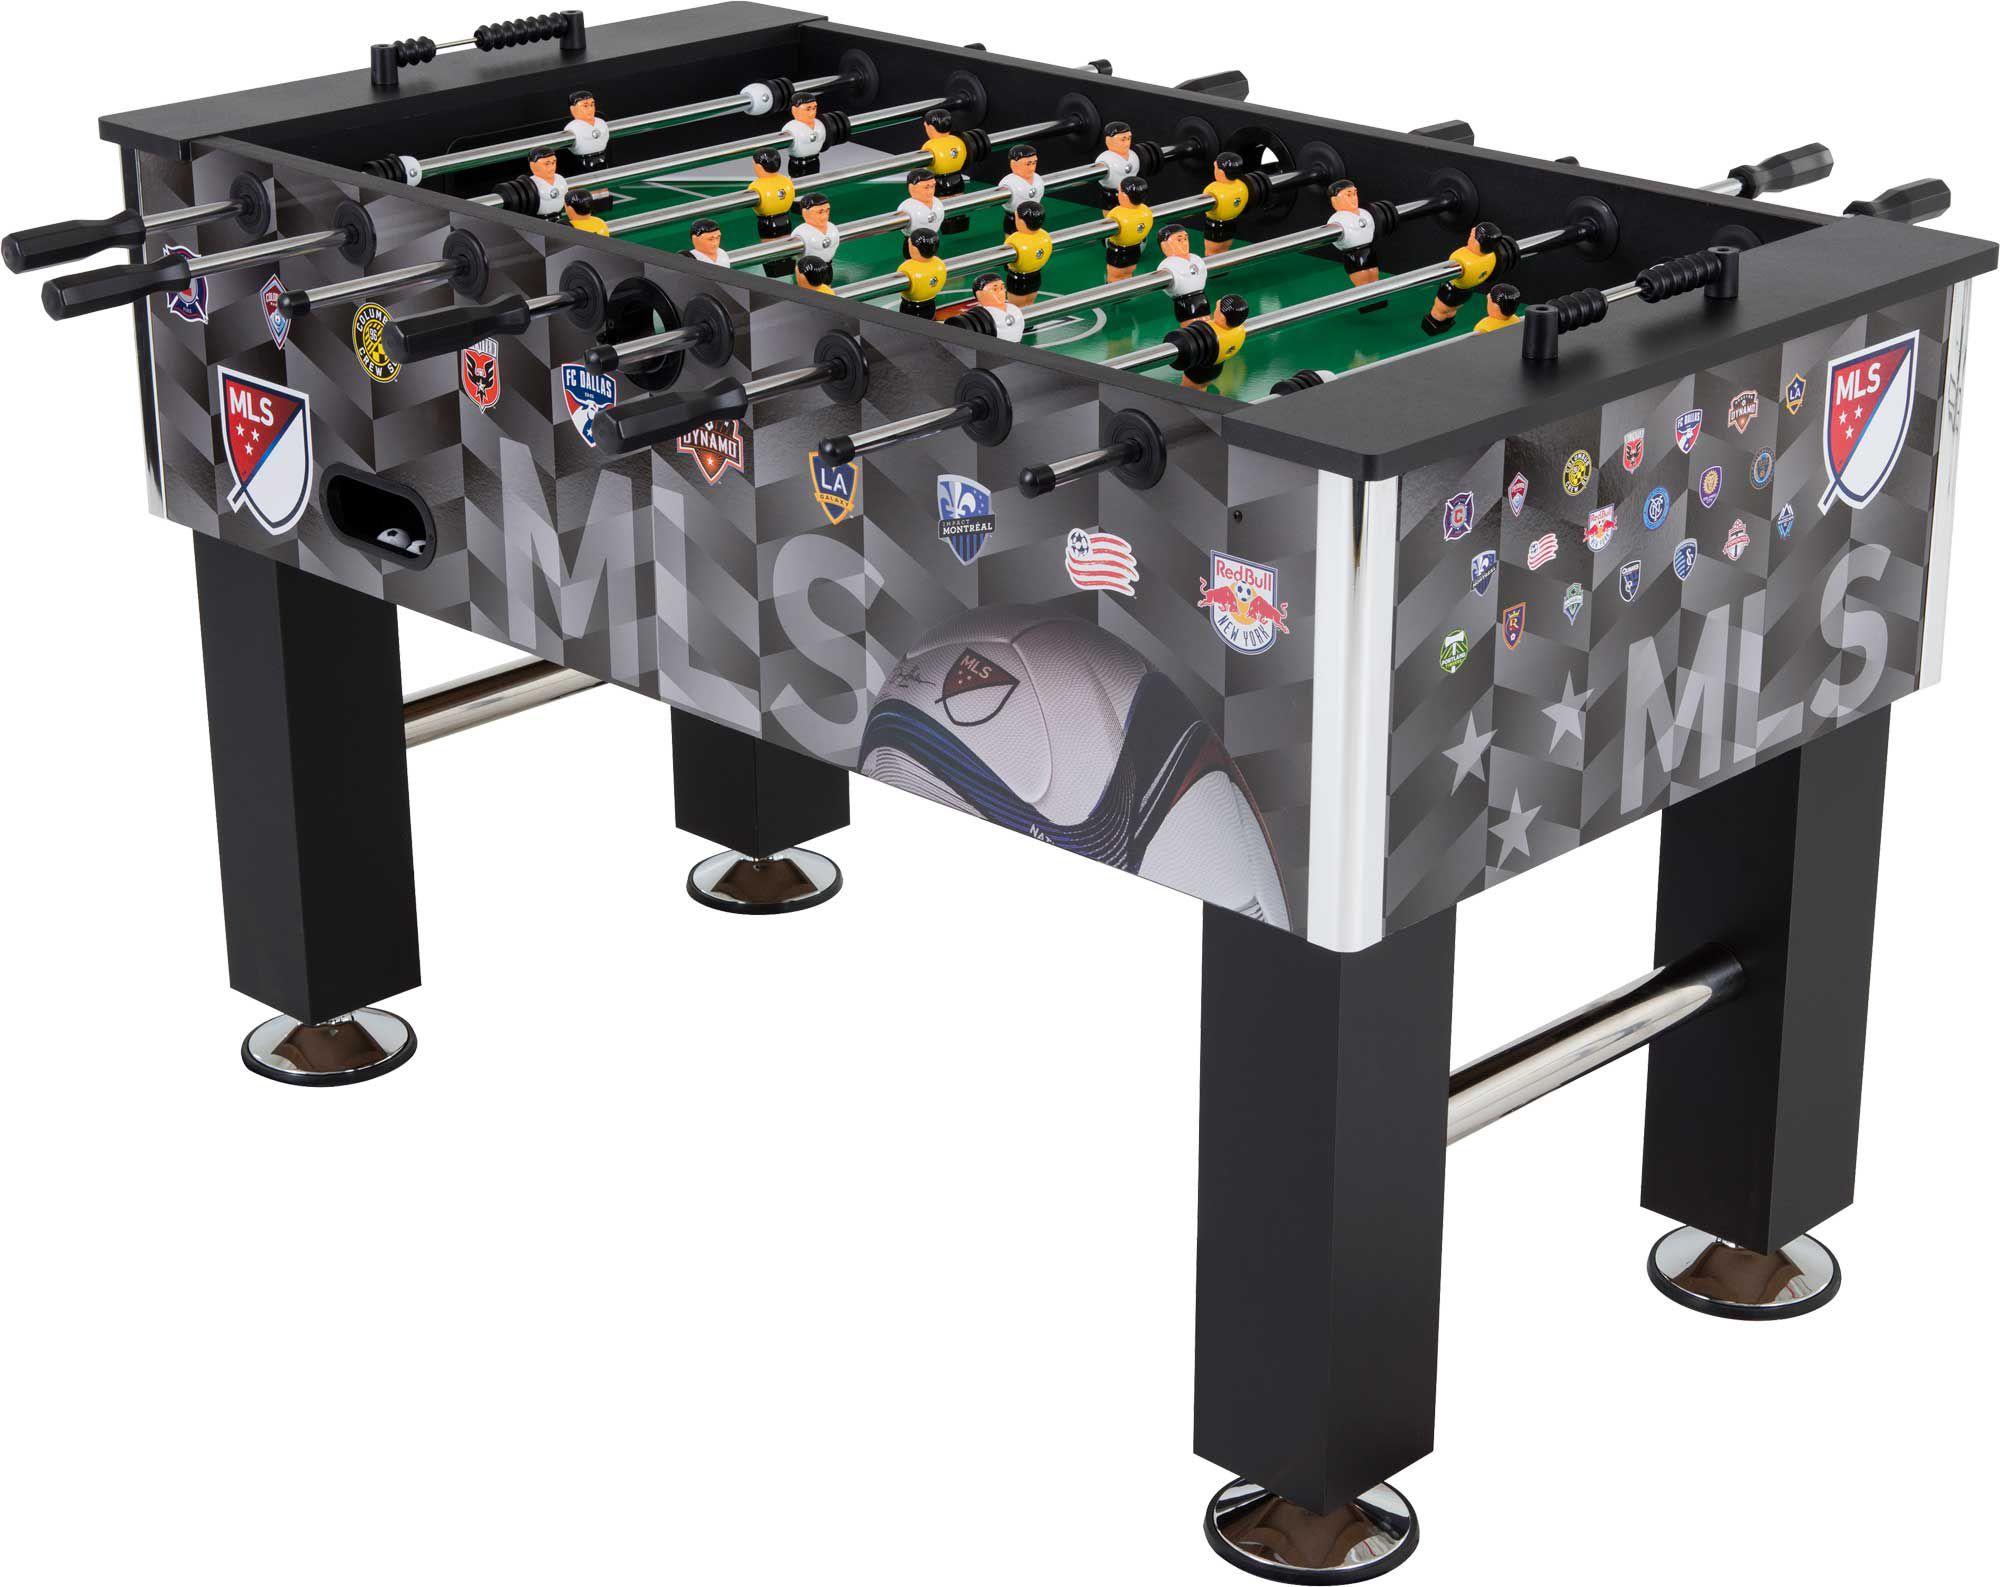 Product Image Triumph Breakaway 57 Corner Kick Mls Foosball Table